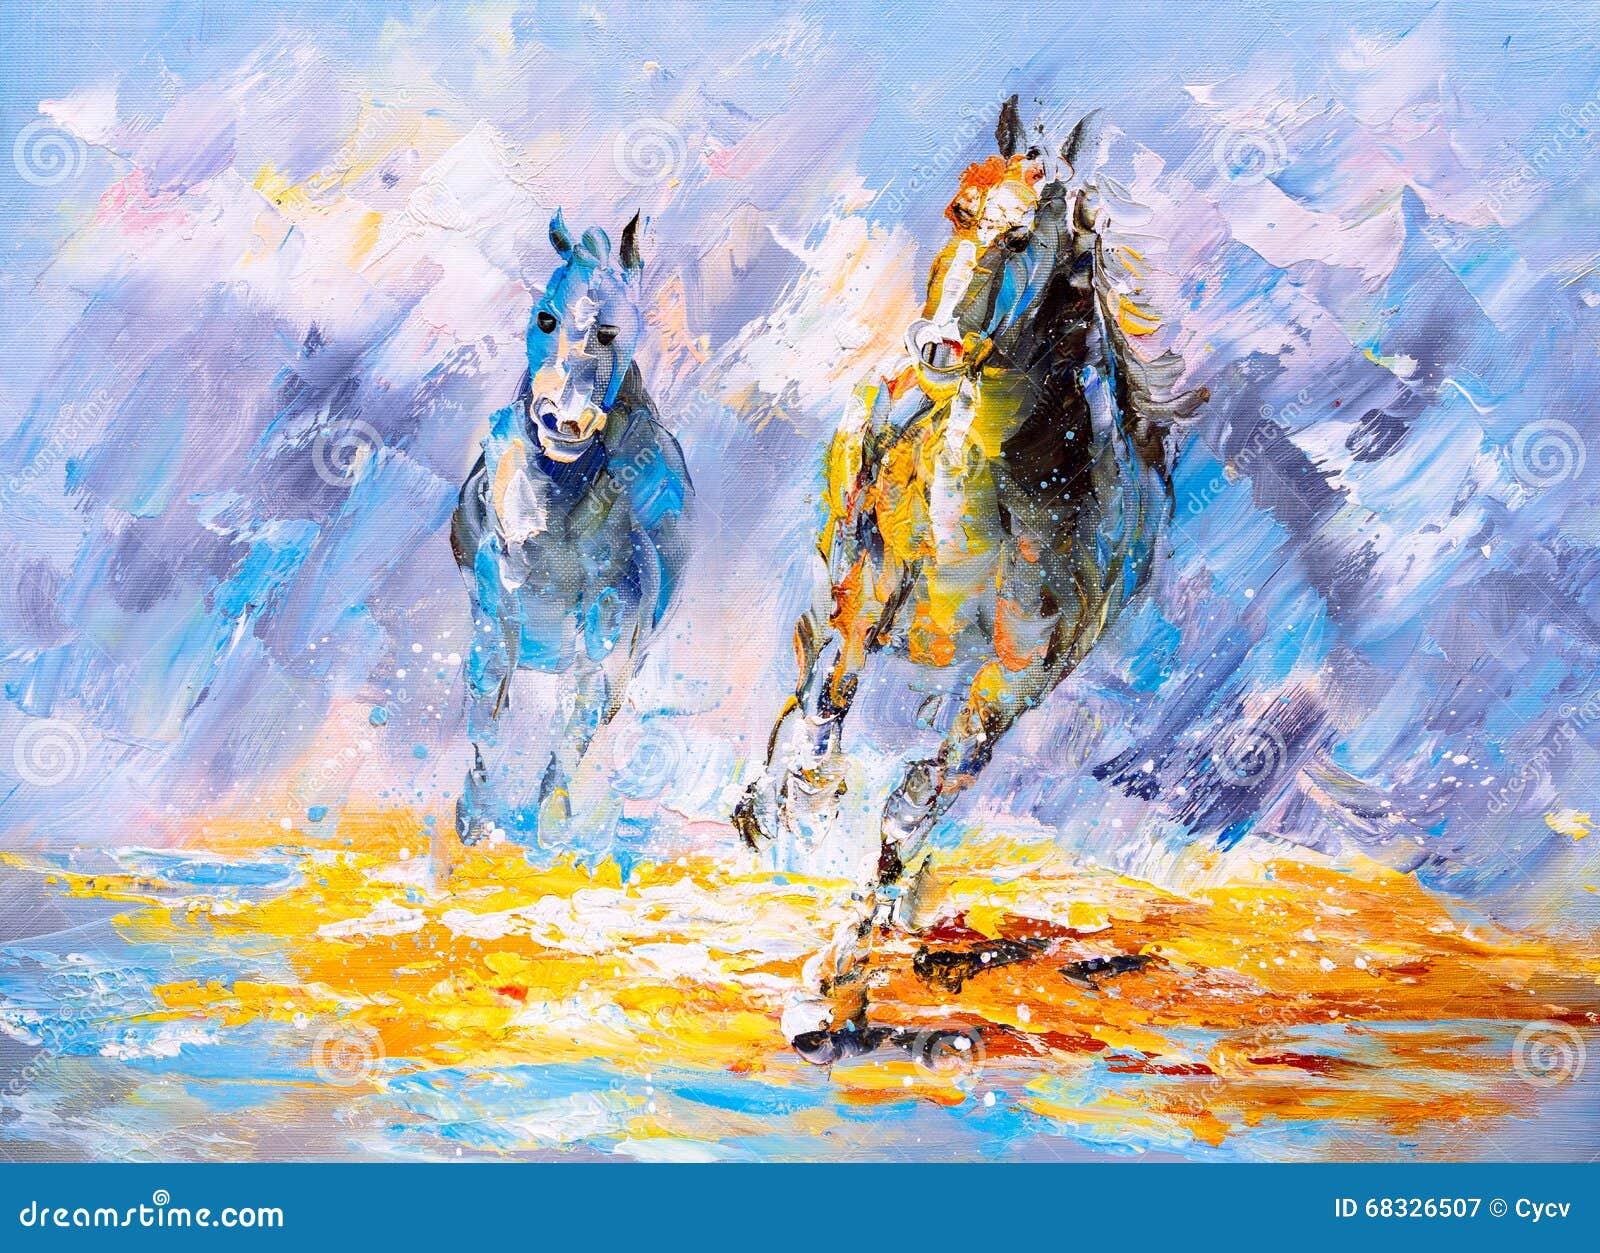 Oil Painting Running Horse Stock Illustration Illustration Of Splash Acrylic 68326507